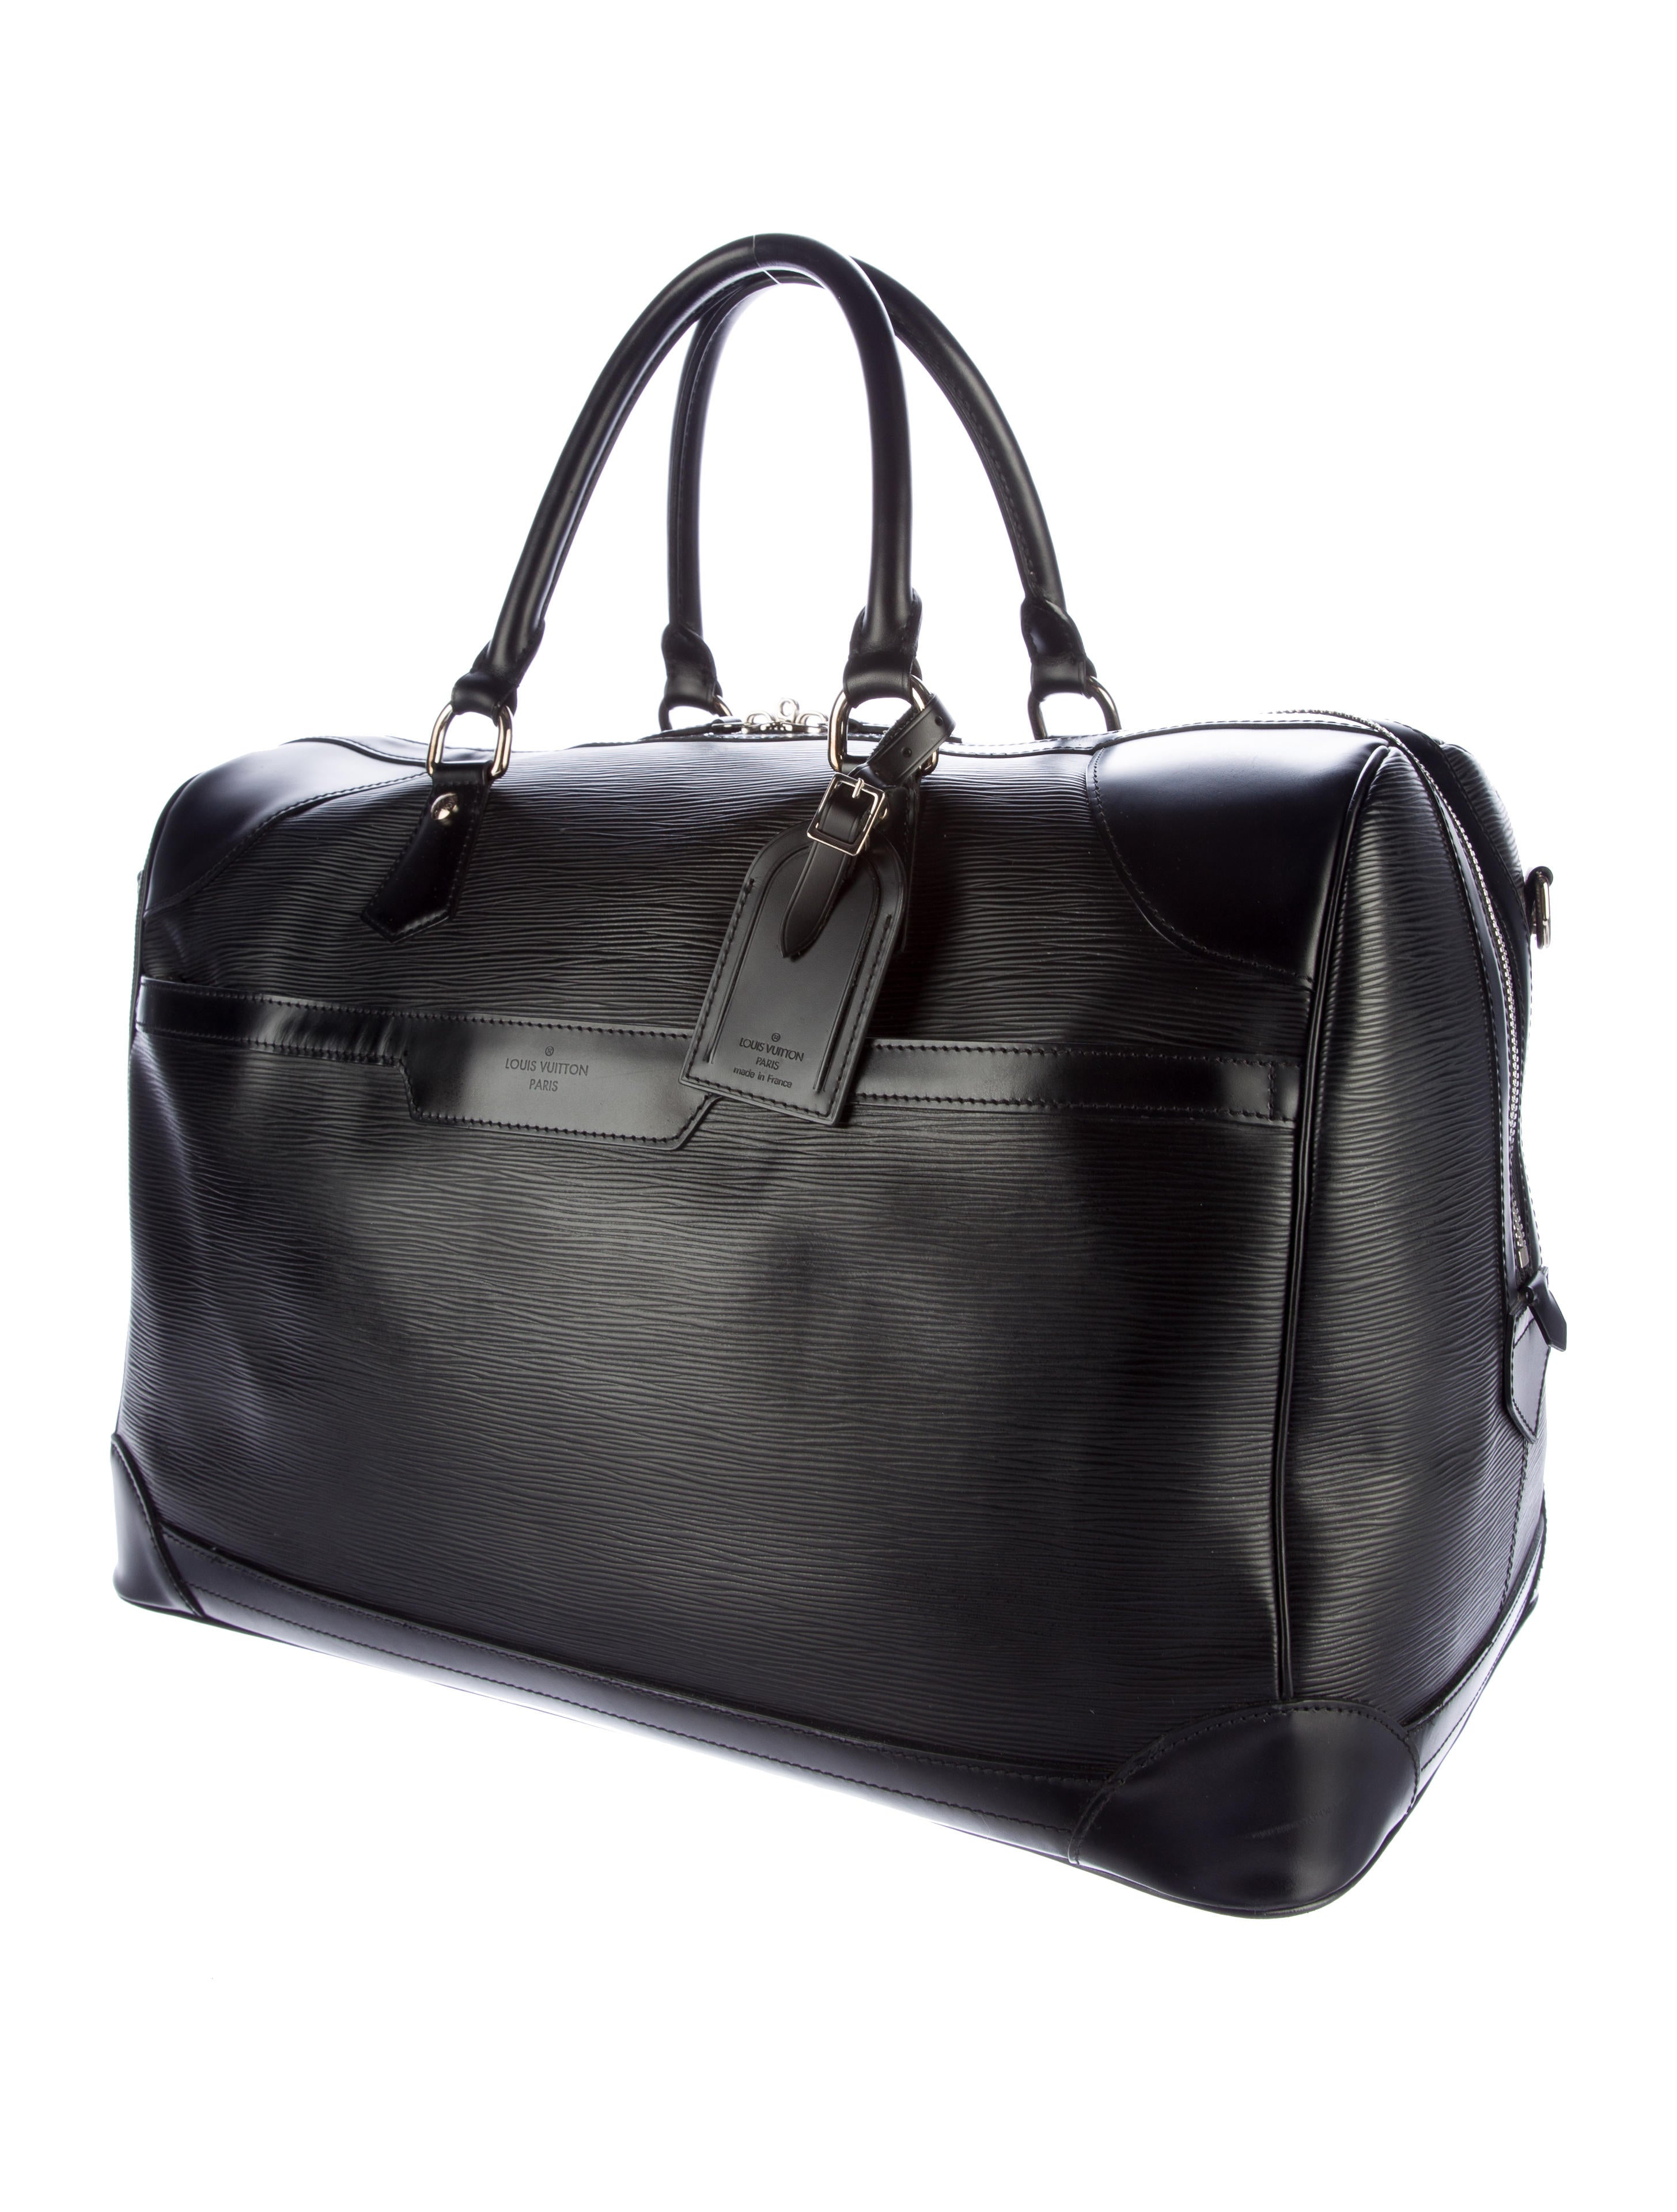 louis vuitton sac de voyage bourget 50 bags lou106893 the realreal. Black Bedroom Furniture Sets. Home Design Ideas